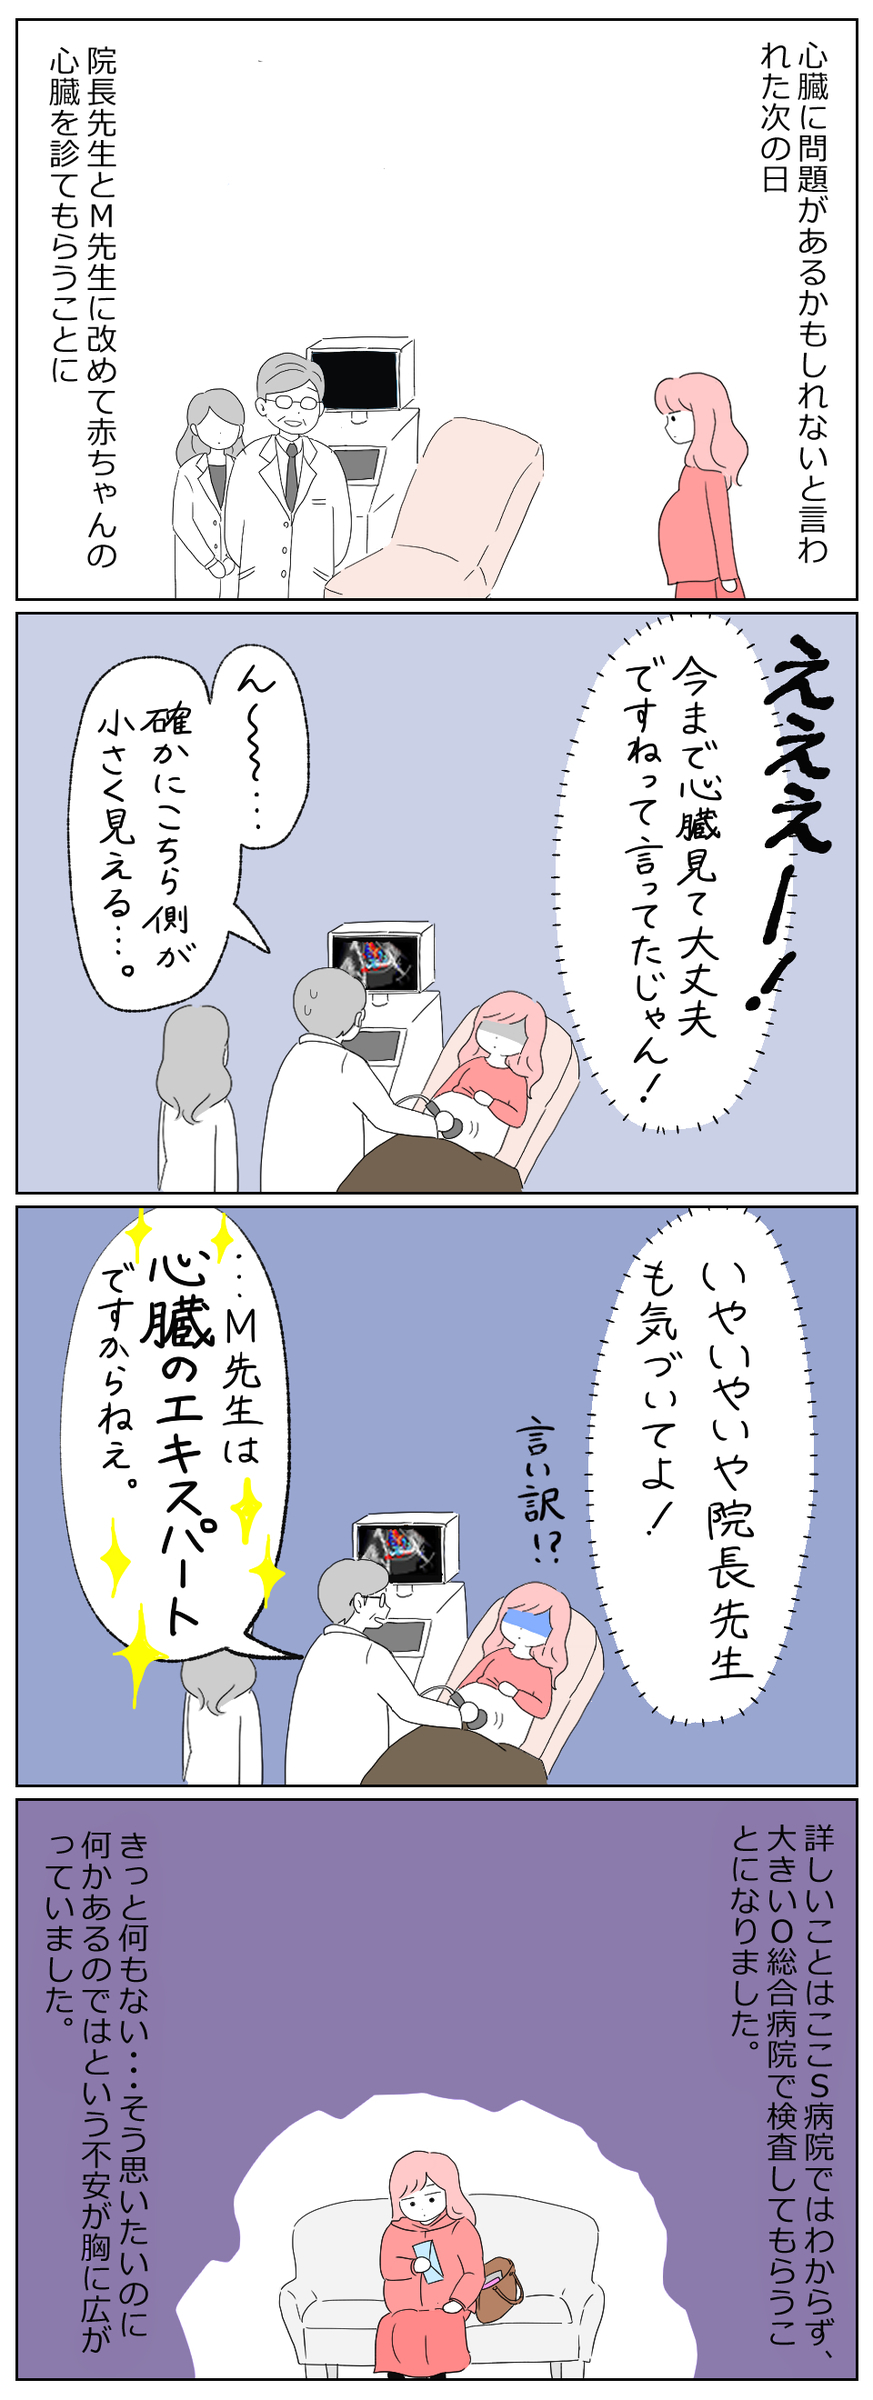 f:id:kayarimo:20190315215859j:plain